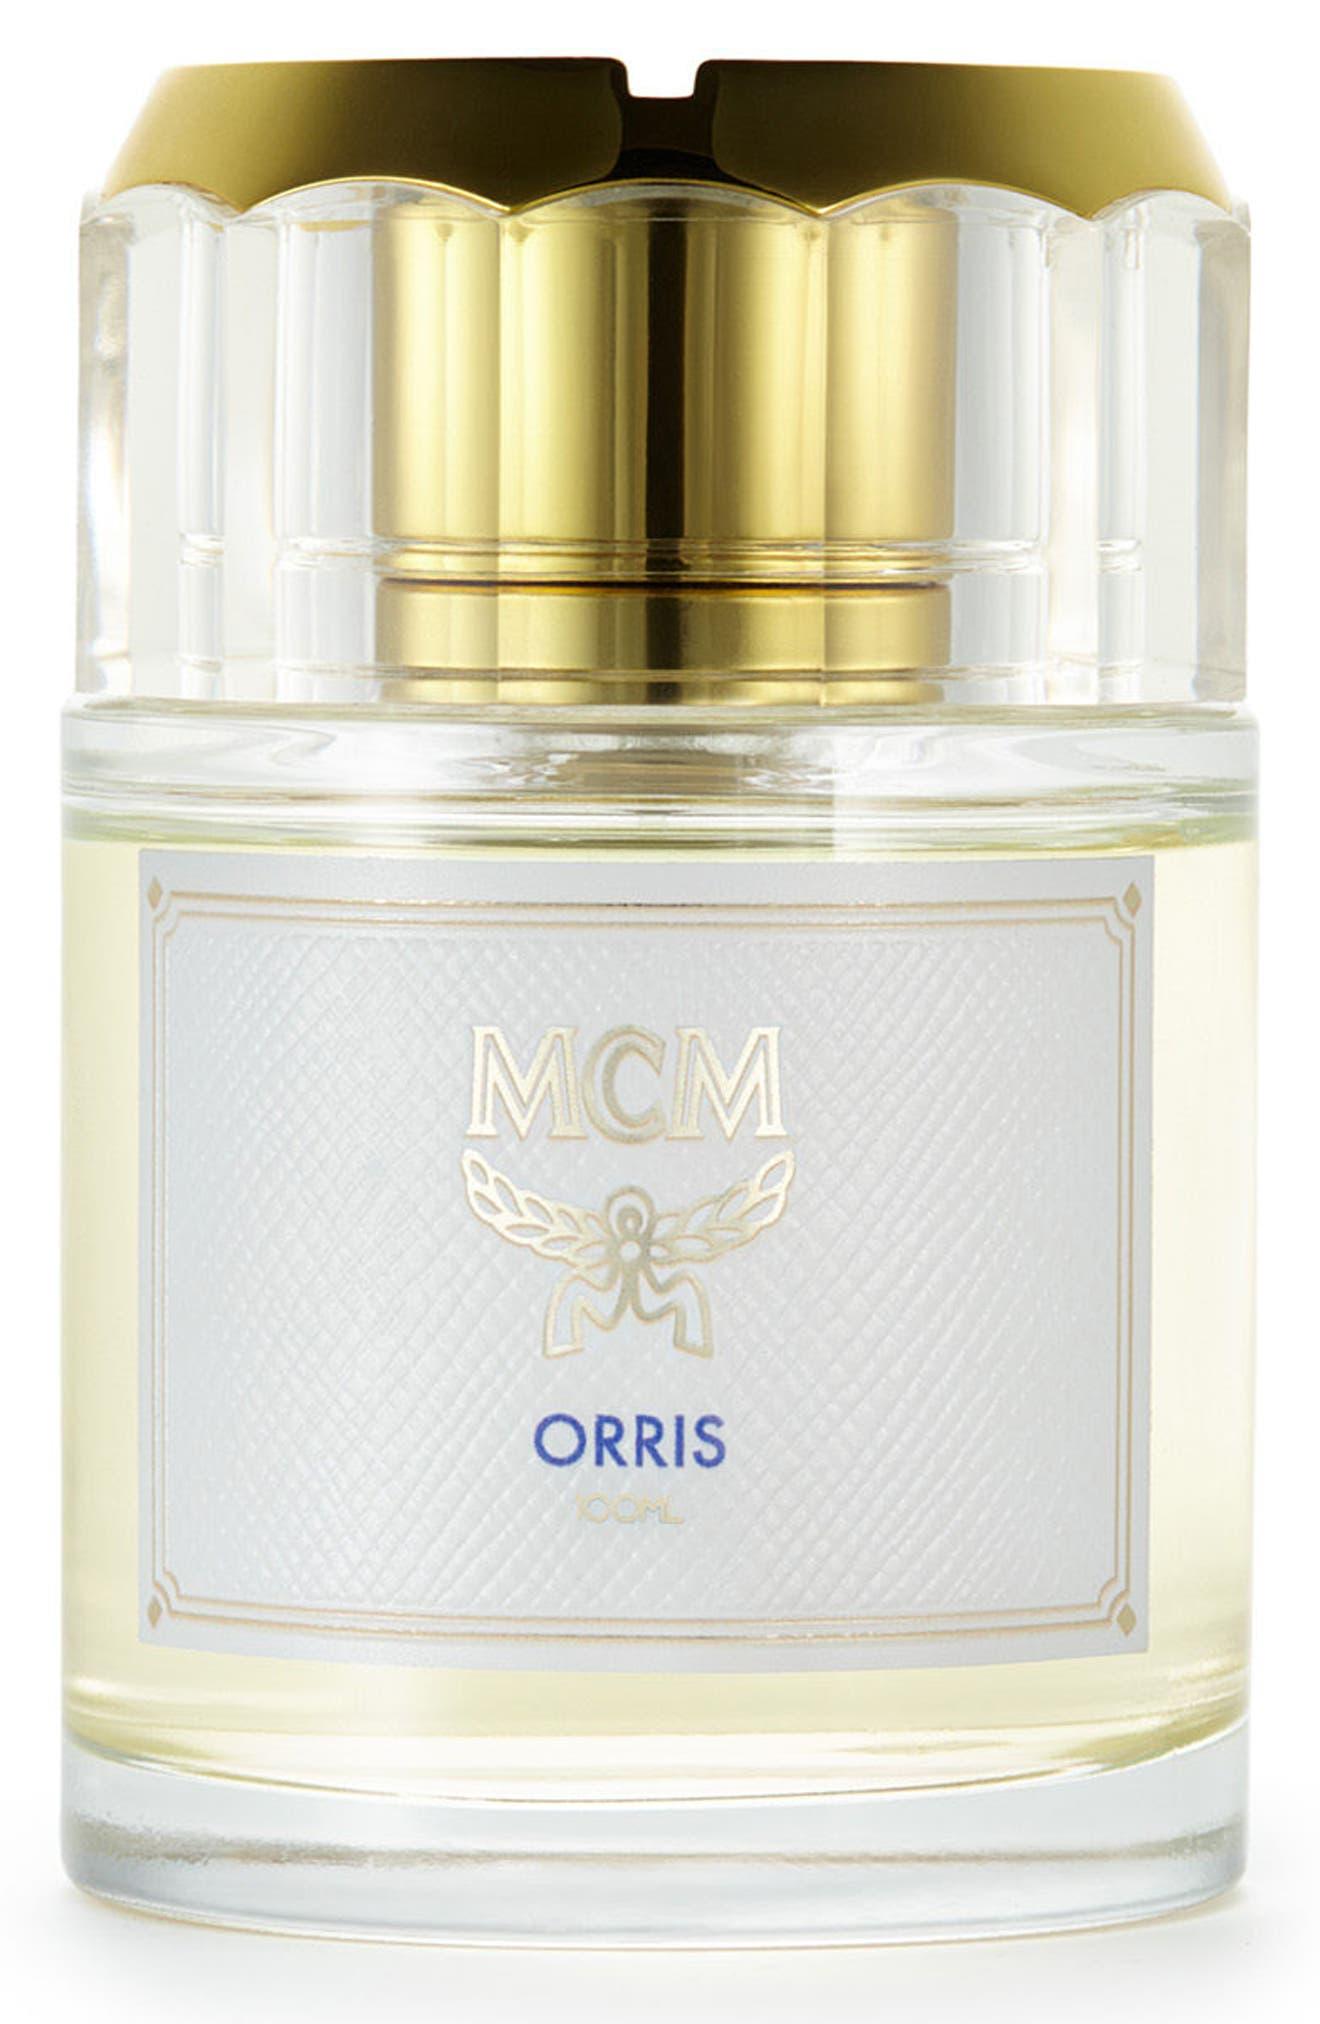 MCM Orris Perfume